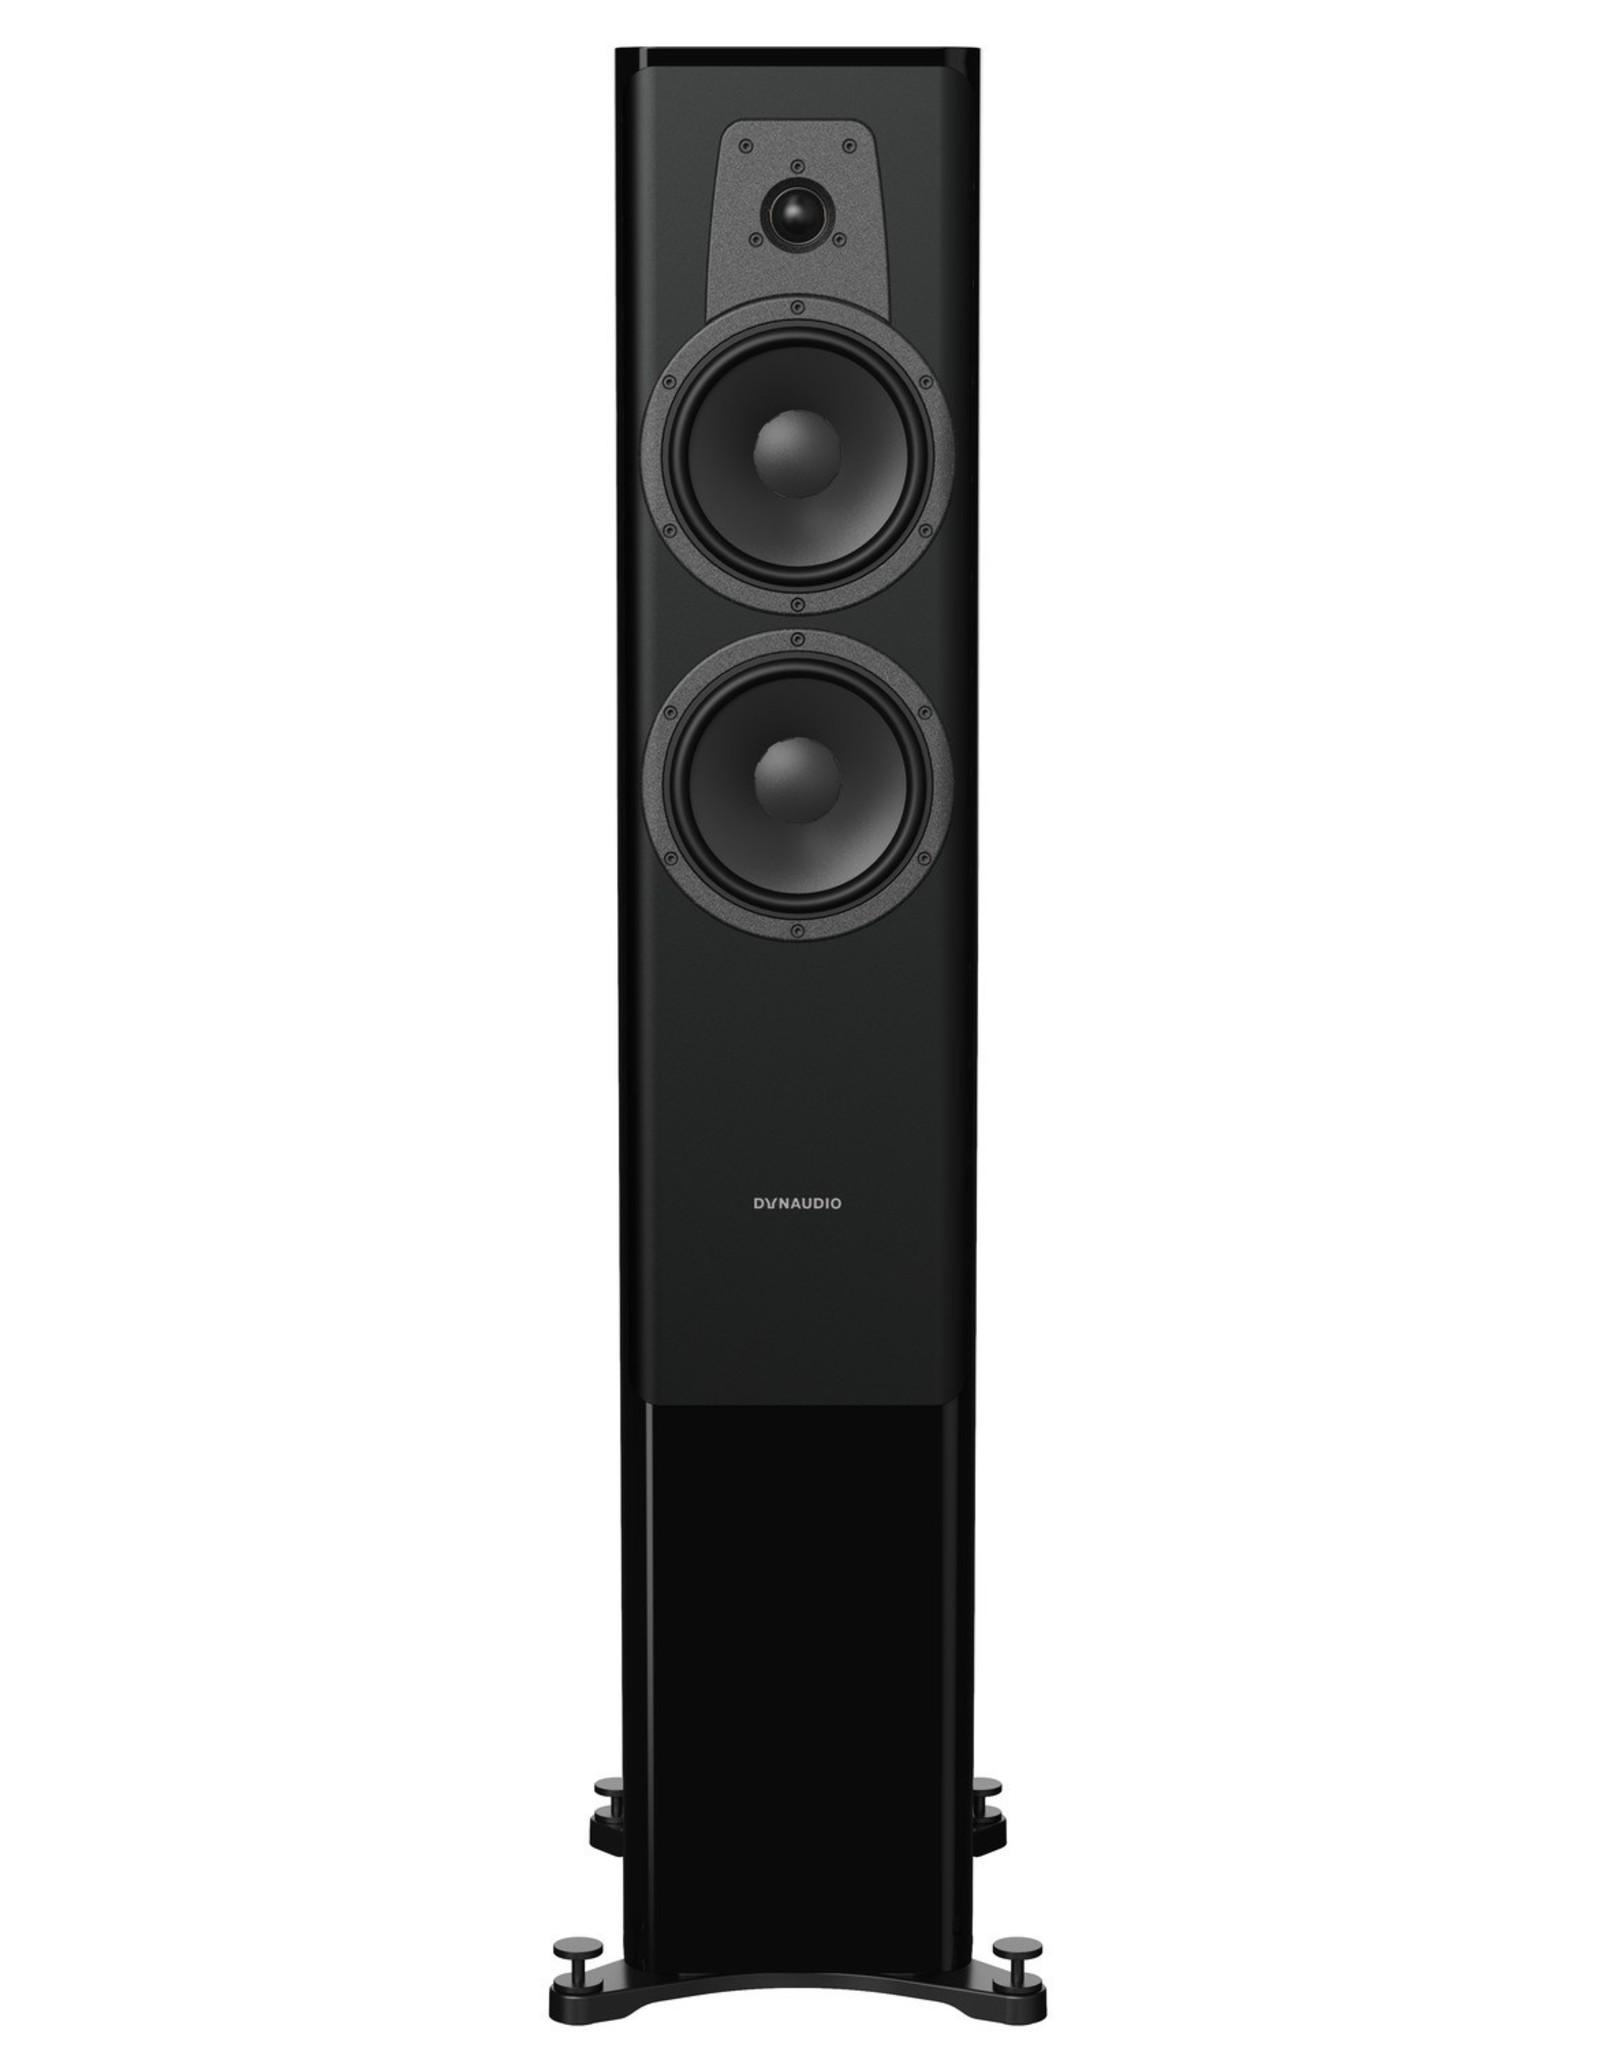 Dynaudio Dynaudio Contour 30i Floorstanding Speakers